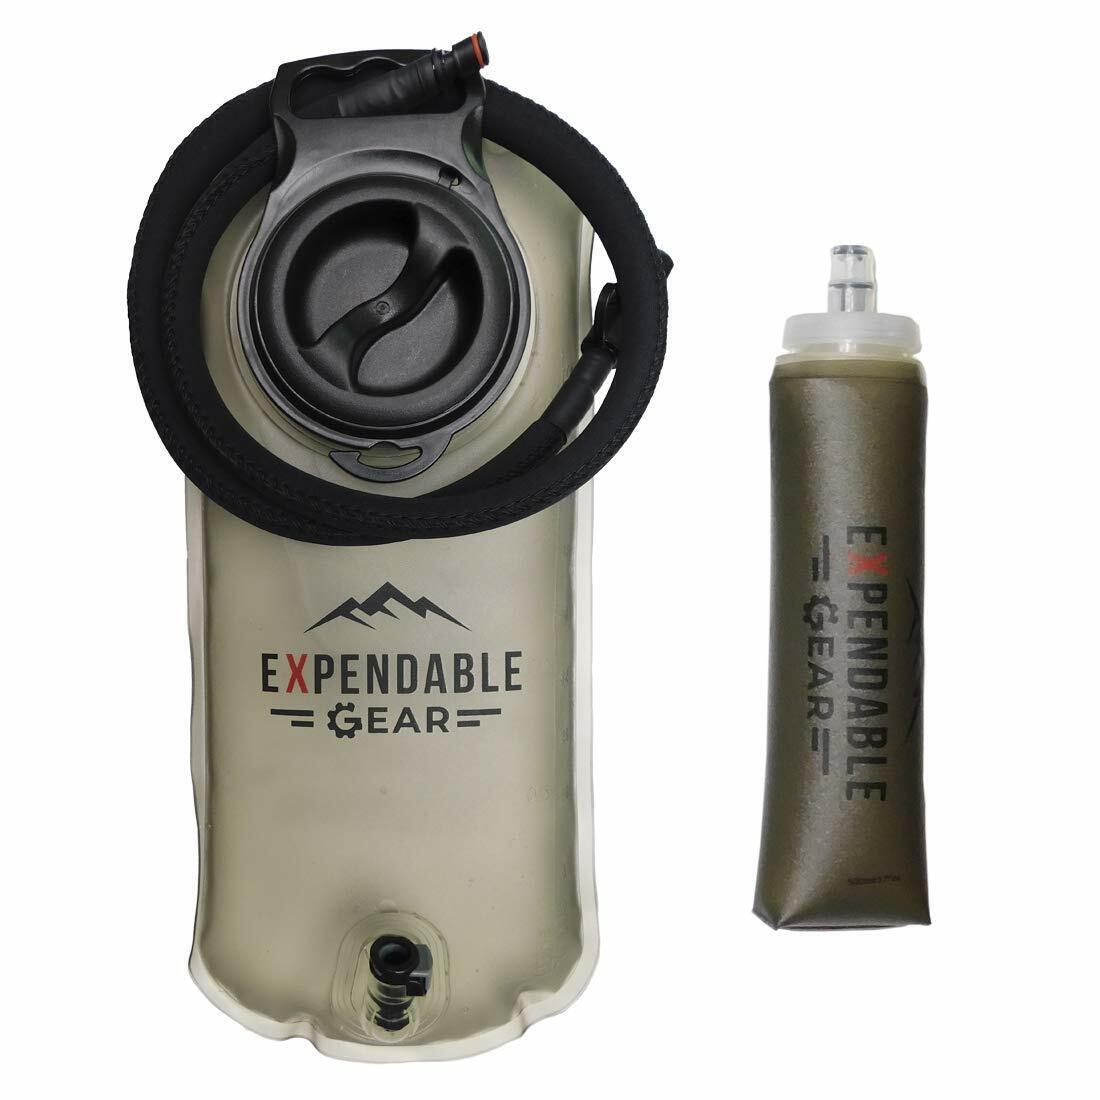 2/3L Hydration Bladder Water Bag Backpack System Survival Pa